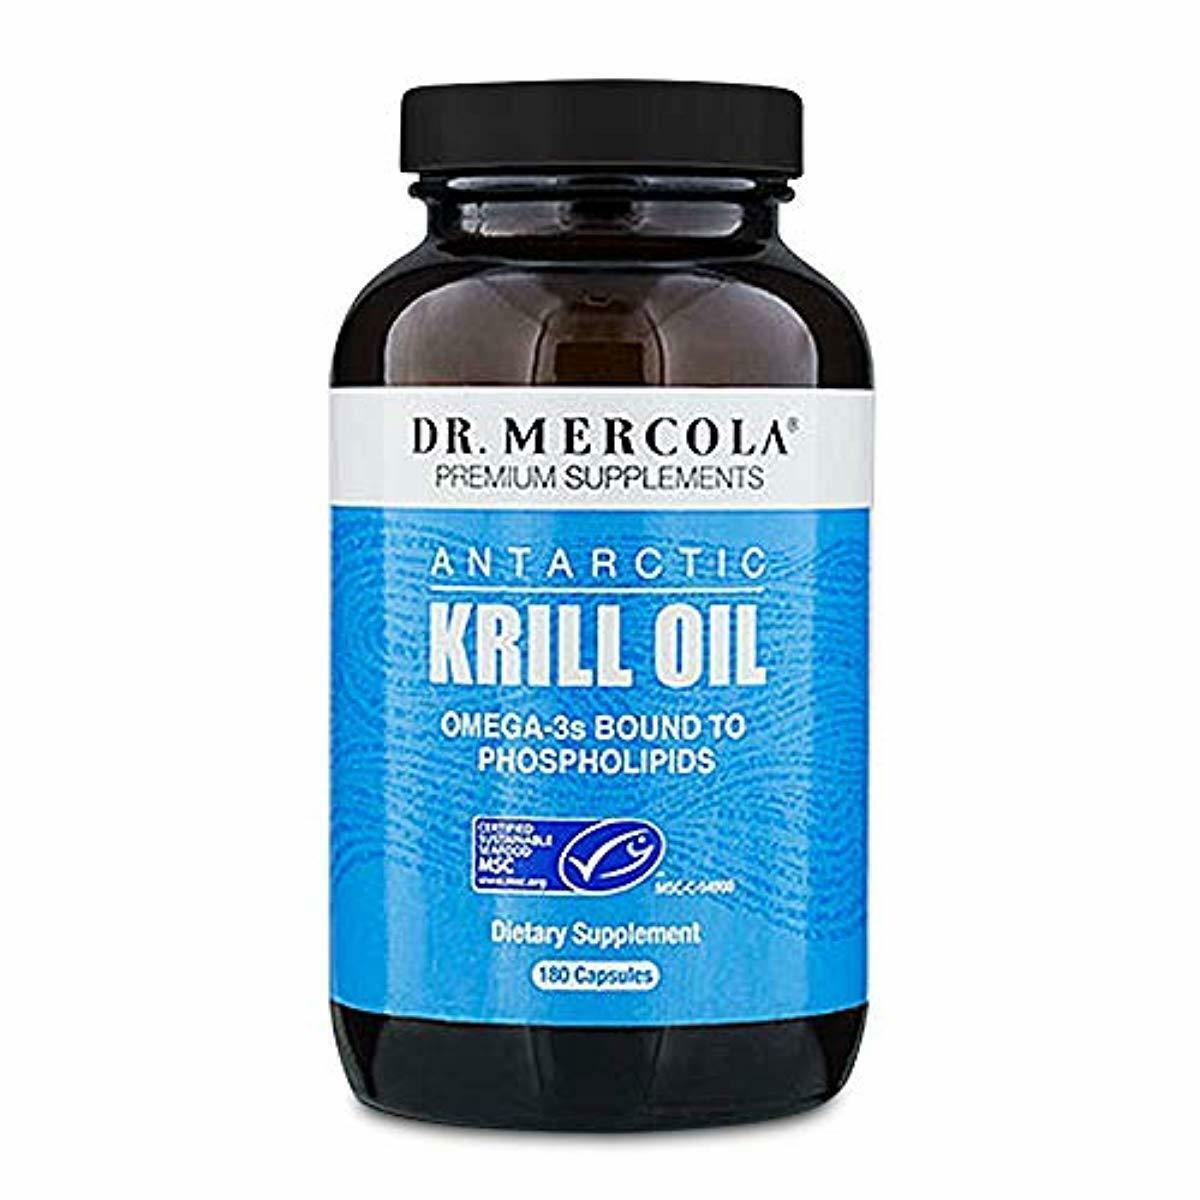 Dr. Mercola Antarctic Krill Oil - 180 Capsules - 1000MG Omeg